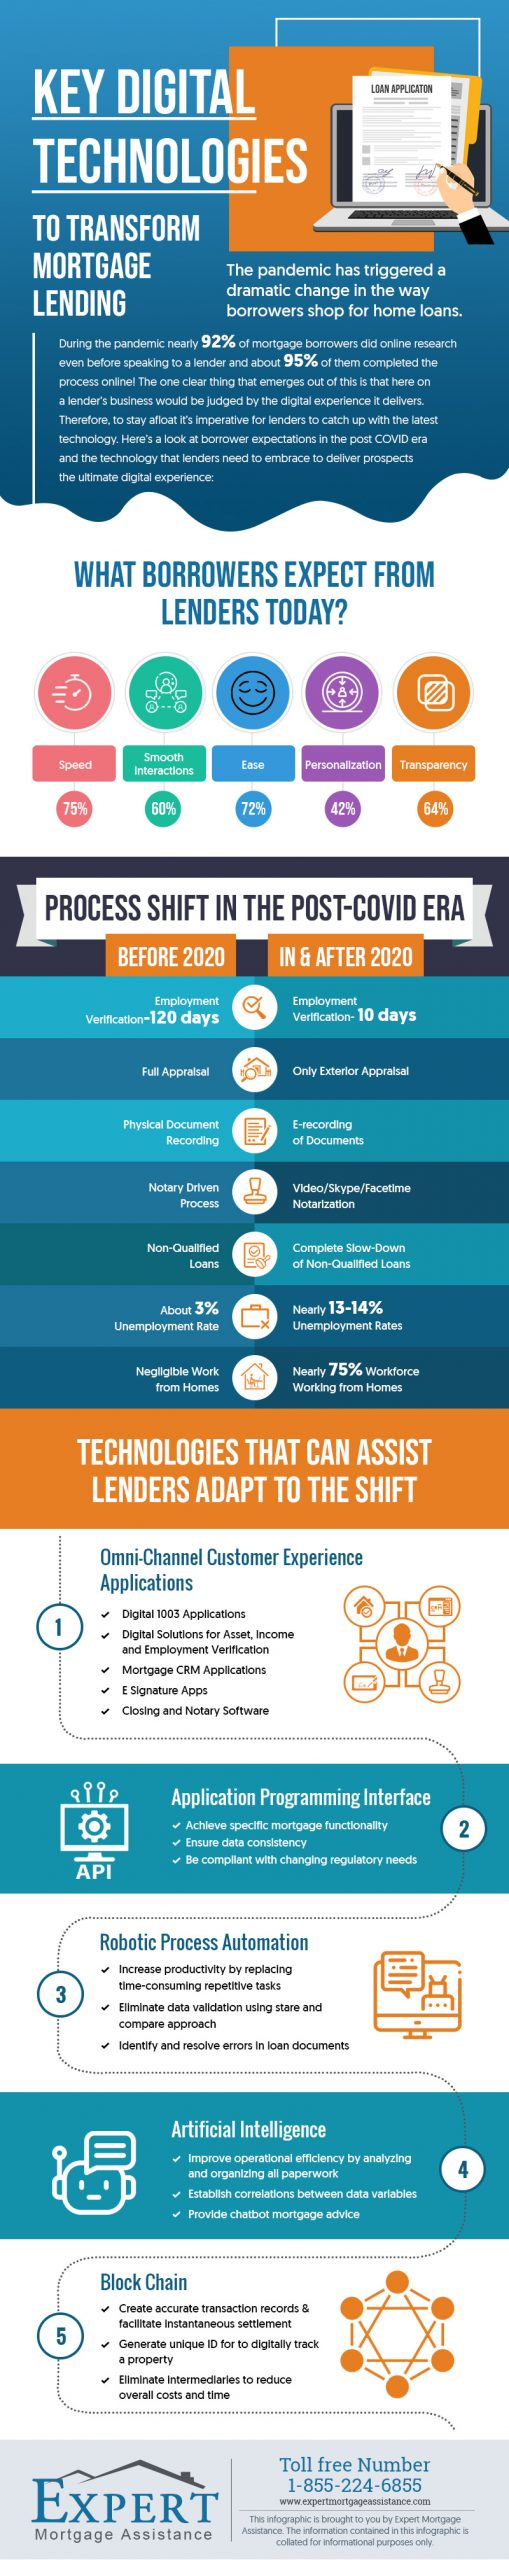 Key Digital Technologies to Transform Mortgage Lending